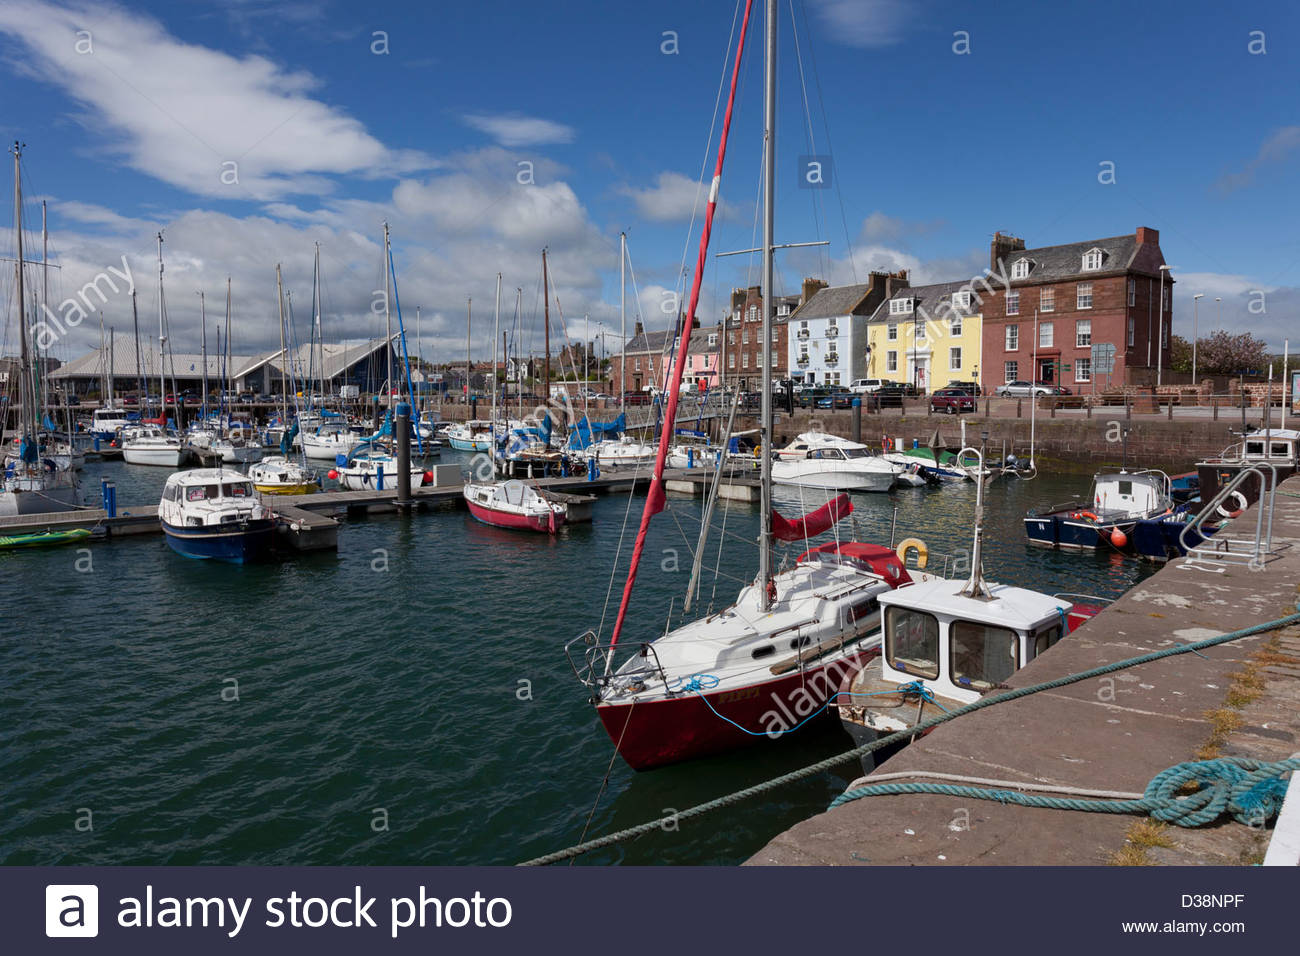 Arbroath Harbour, Arbroath, Angus. - Stock Image